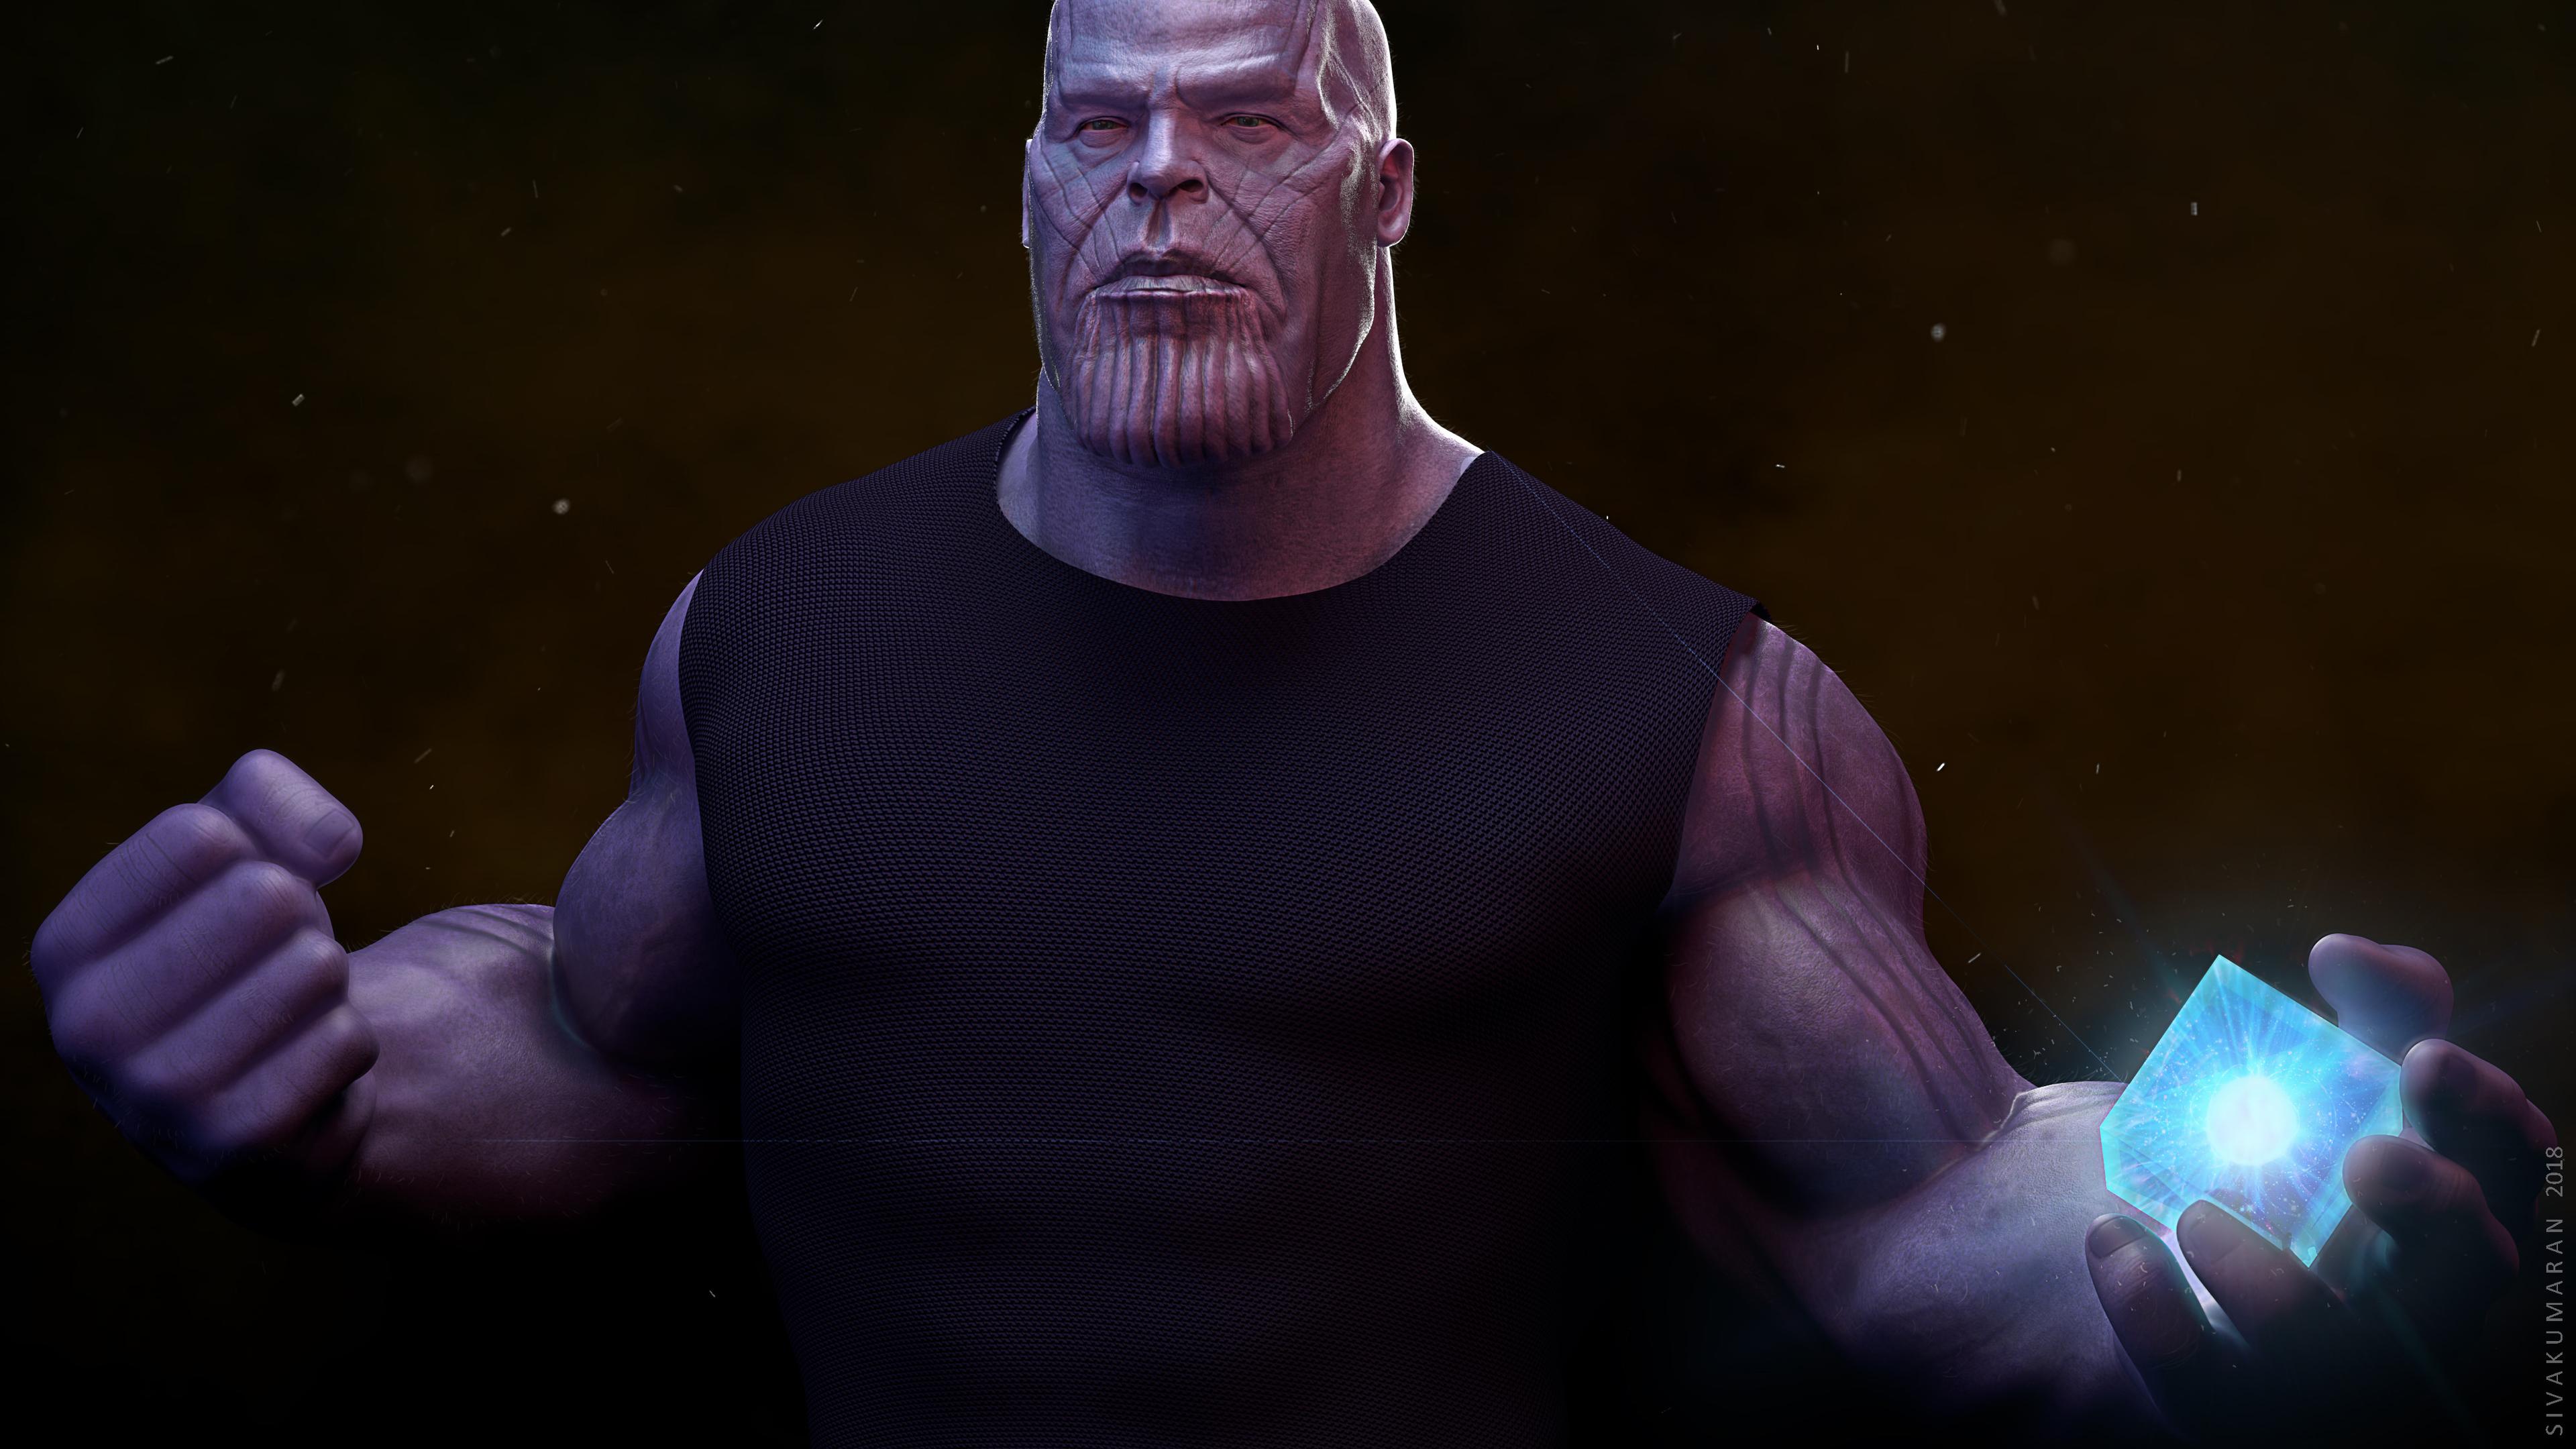 thanos holding tesseract 4k 1540746444 - Thanos Holding Tesseract 4k - thanos-wallpapers, supervillain wallpapers, superheroes wallpapers, hd-wallpapers, digital art wallpapers, cgi wallpapers, artwork wallpapers, artstation wallpapers, 4k-wallpapers